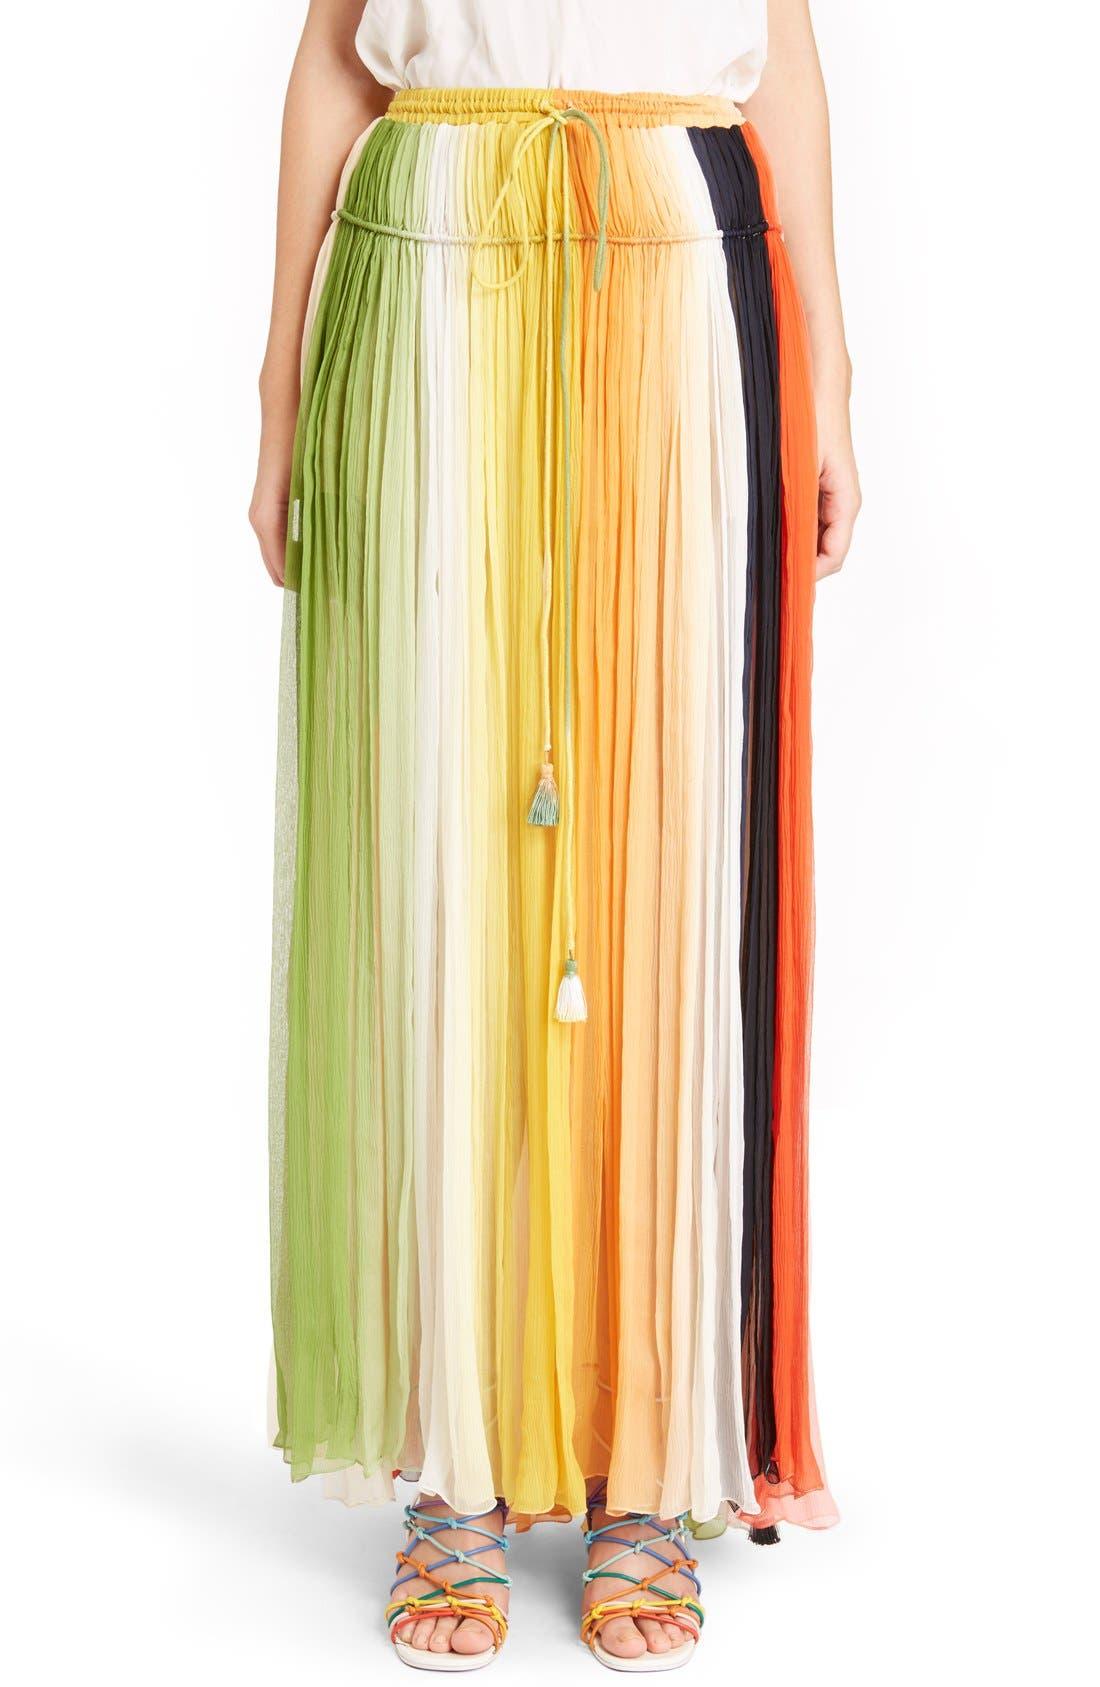 Alternate Image 1 Selected - Chloé Stripe Pleated Silk Skirt with Tassels